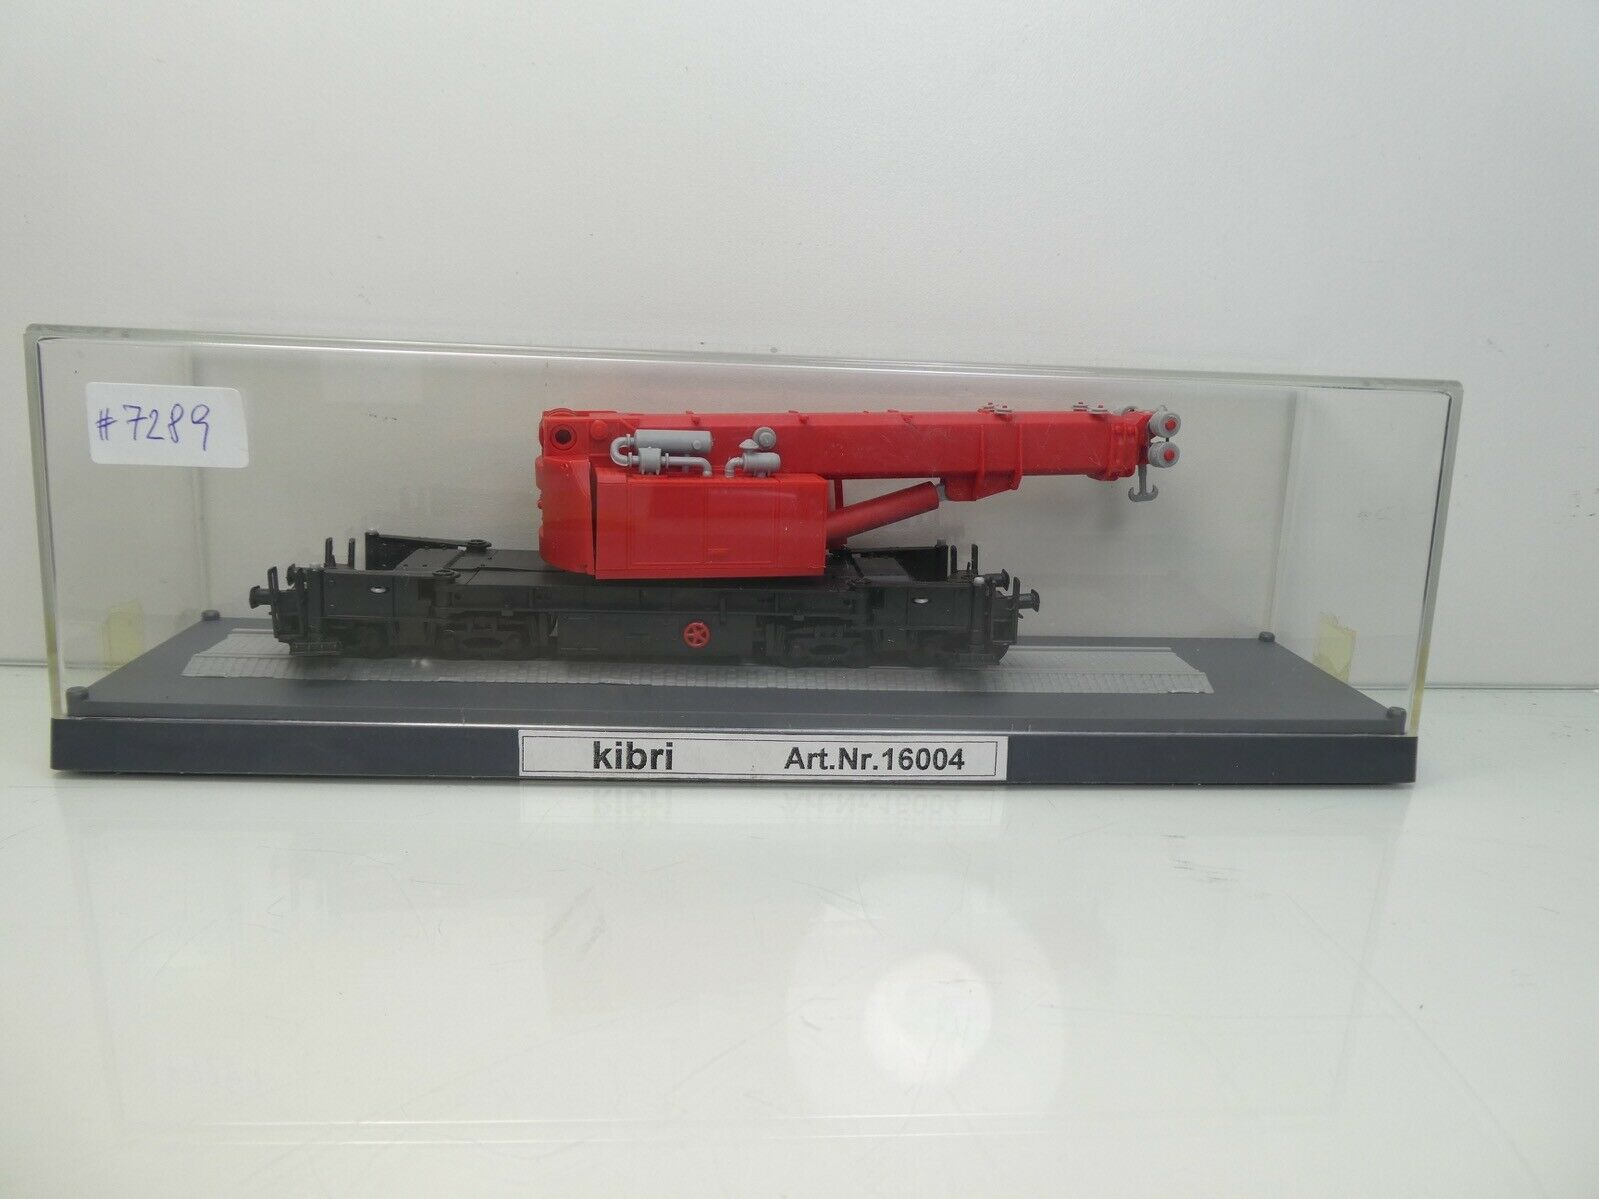 outlet in vendita Kibri 16004 - H0 - Eisenbahn Eisenbahn Eisenbahn Teleskopkran Gottwald GS 100.06T - TOP OVP -  7289  memorizzare